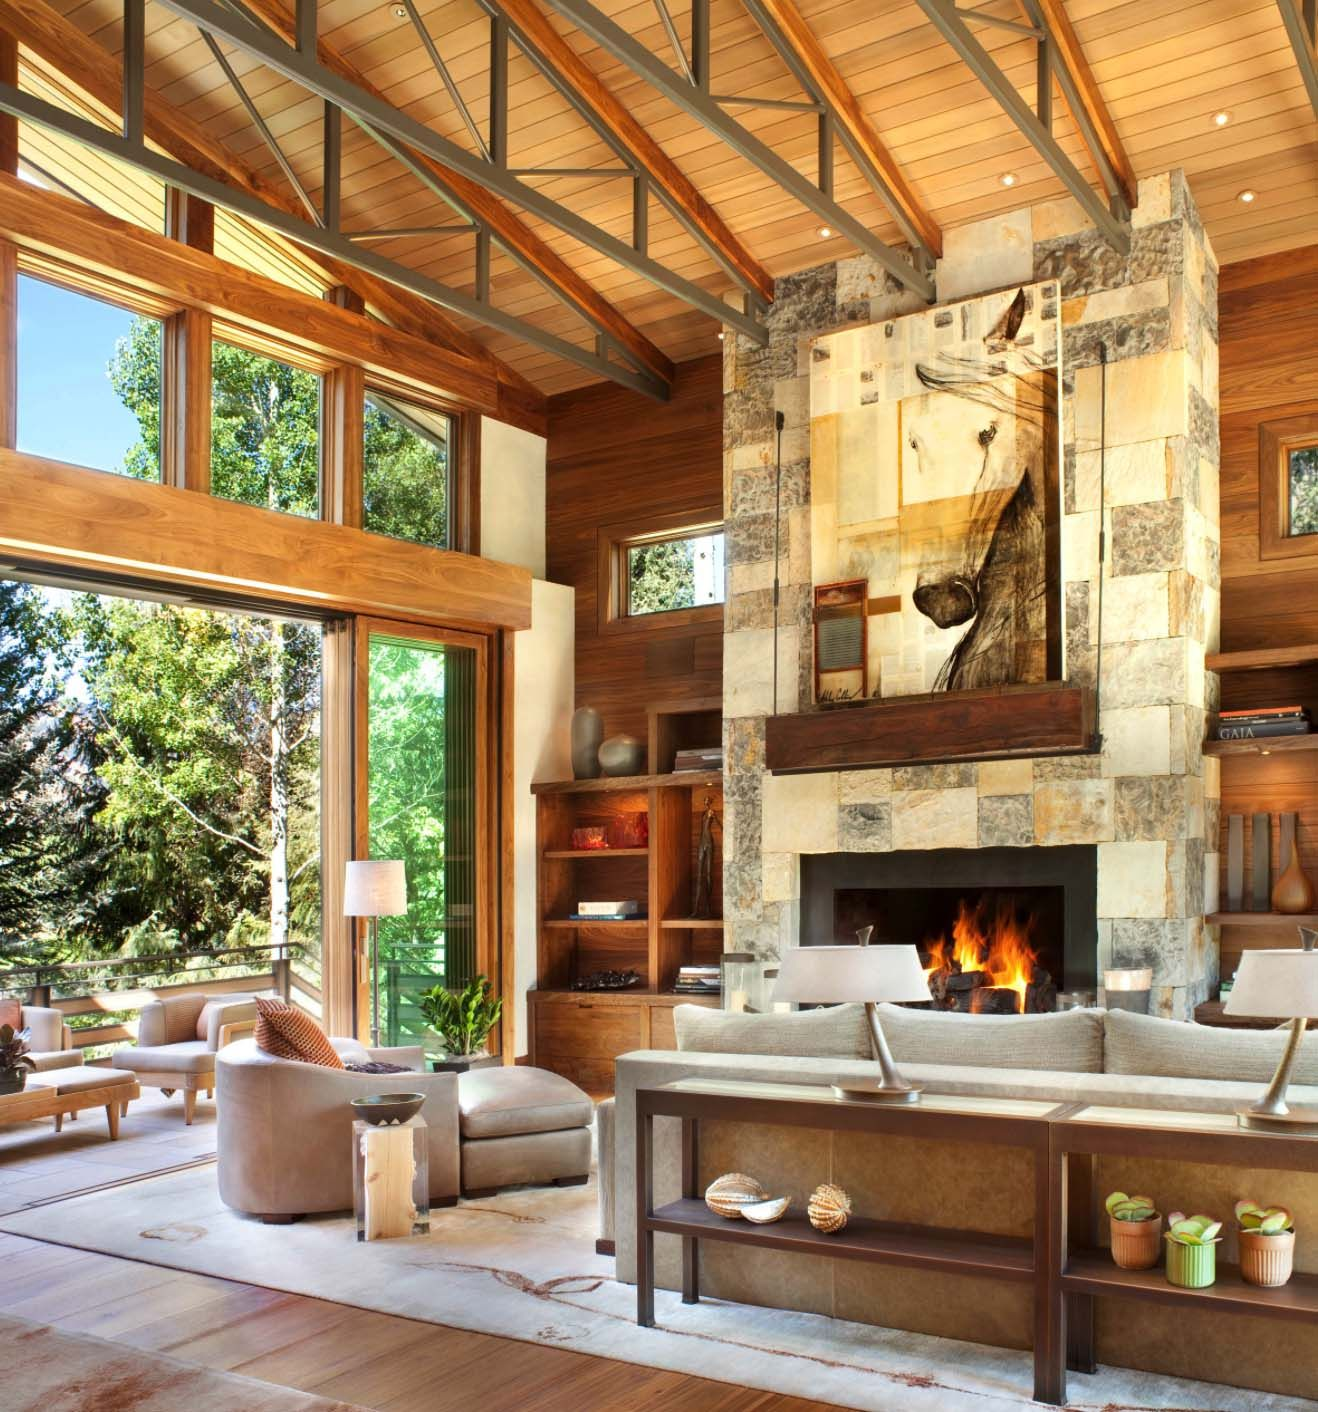 Mountain Home Decor Ideas Part - 43: Captivating Modern-rustic Home In The Colorado Mountains